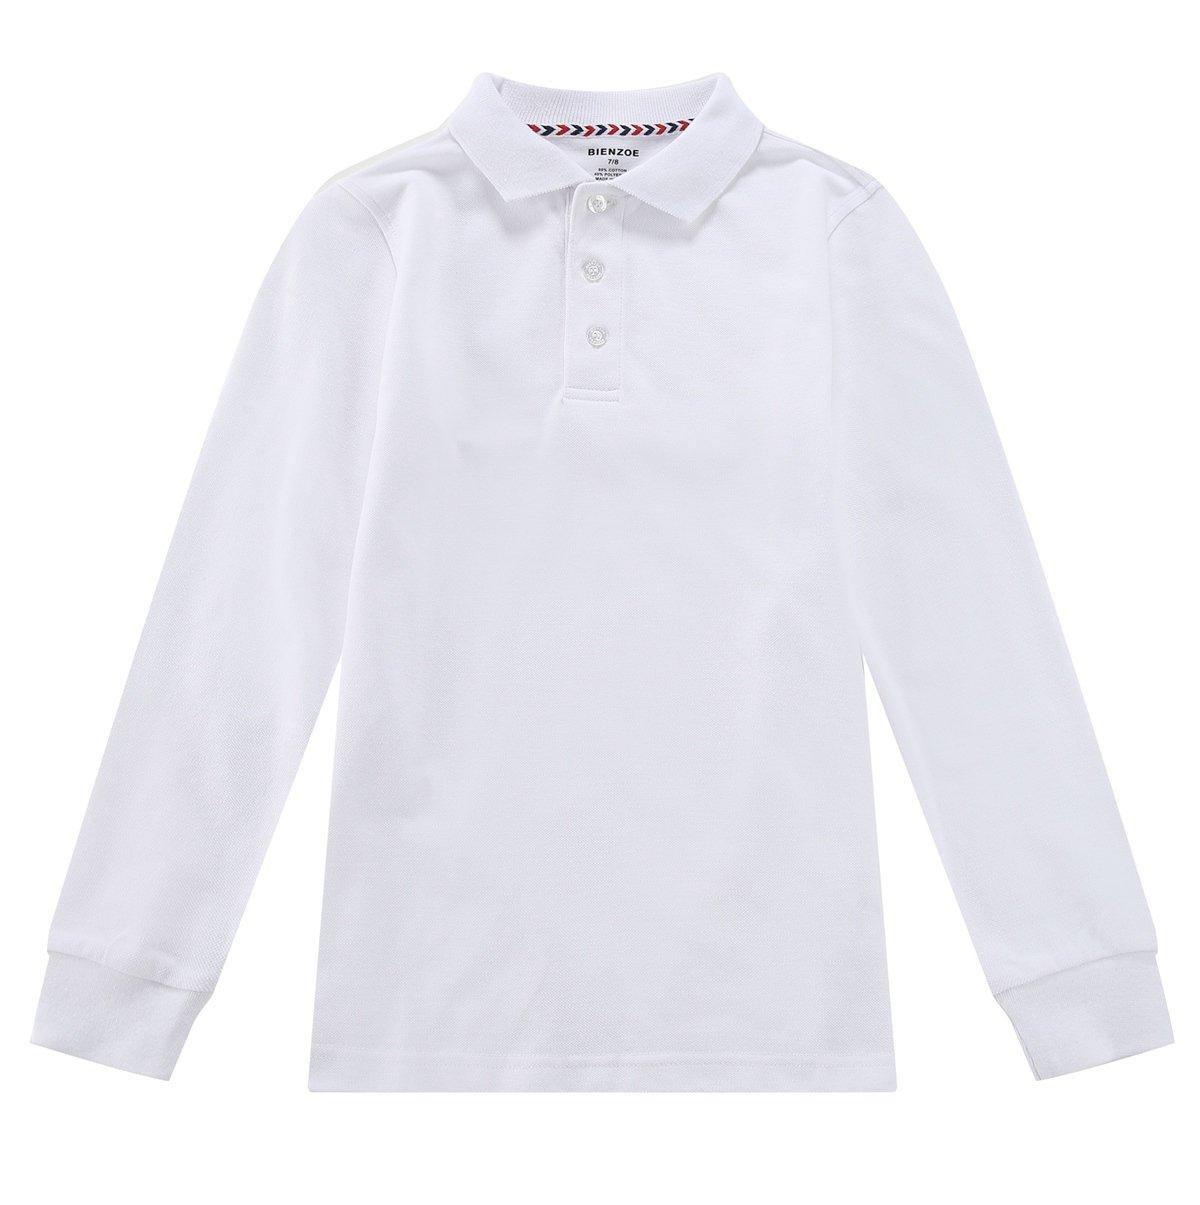 Bienzoe Boy's School Uniform Antimicrobial Breathable Quick Dry Long Sleeve Polo